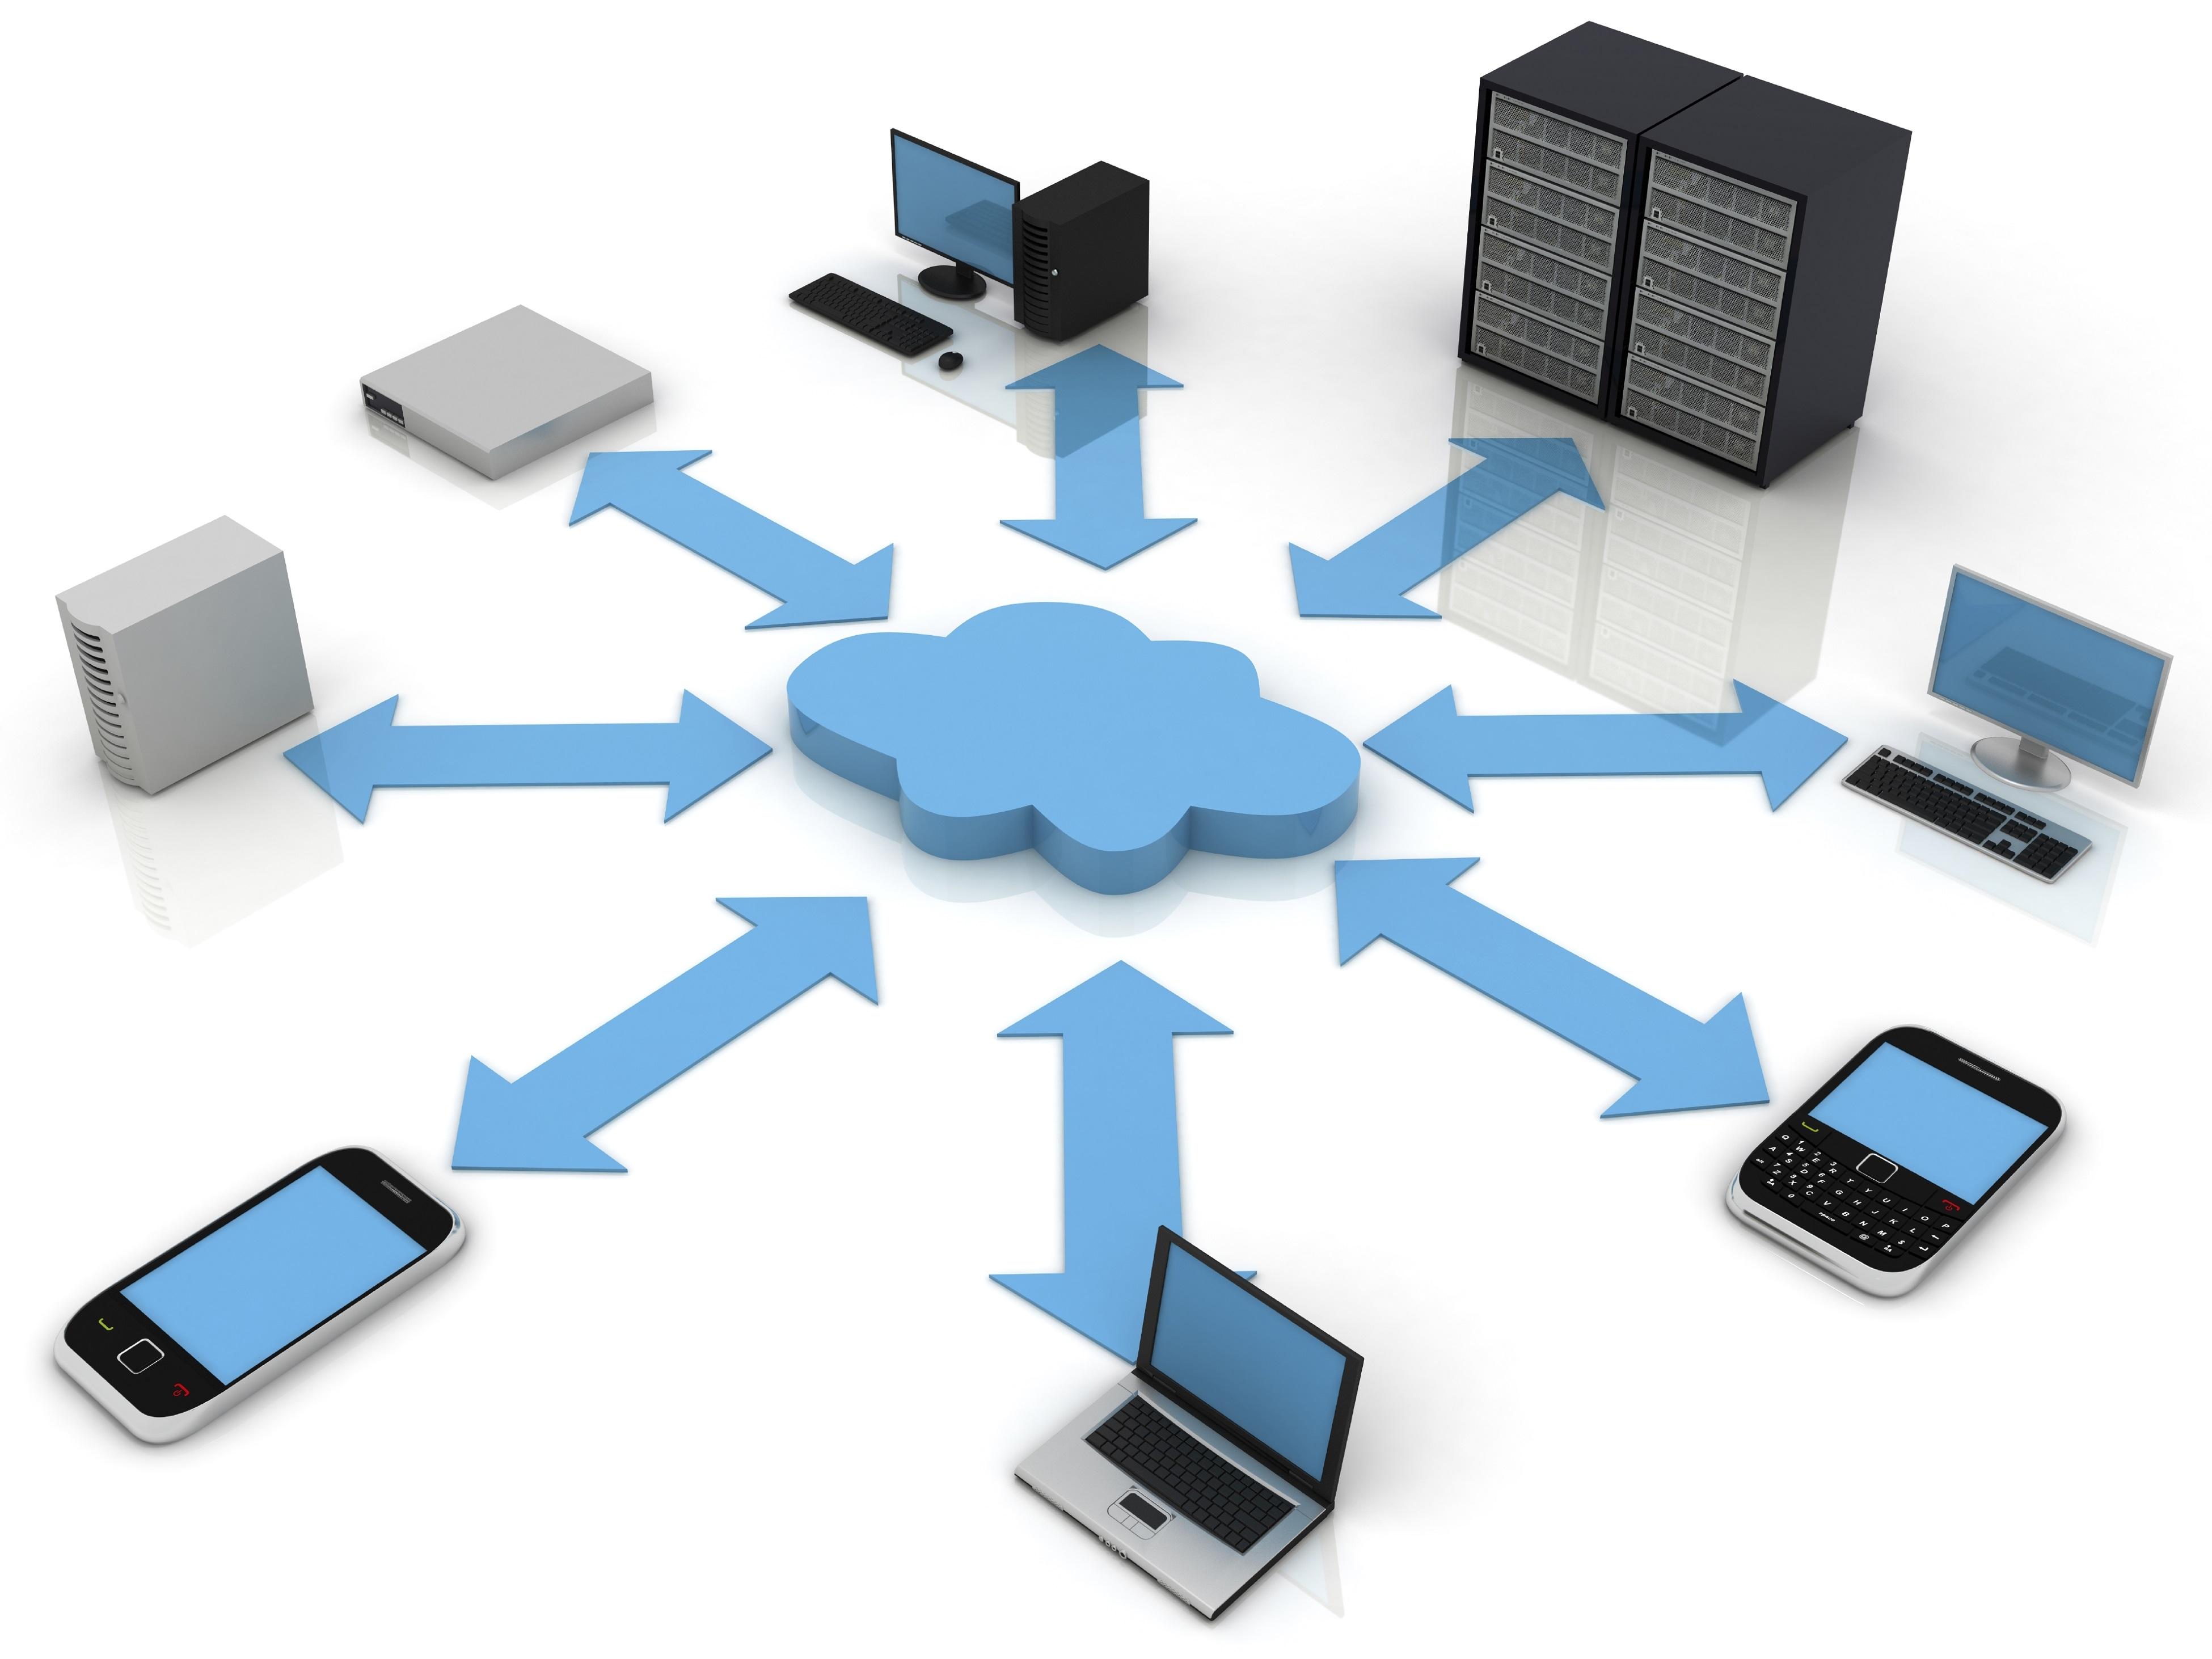 Cloud Diagram Network